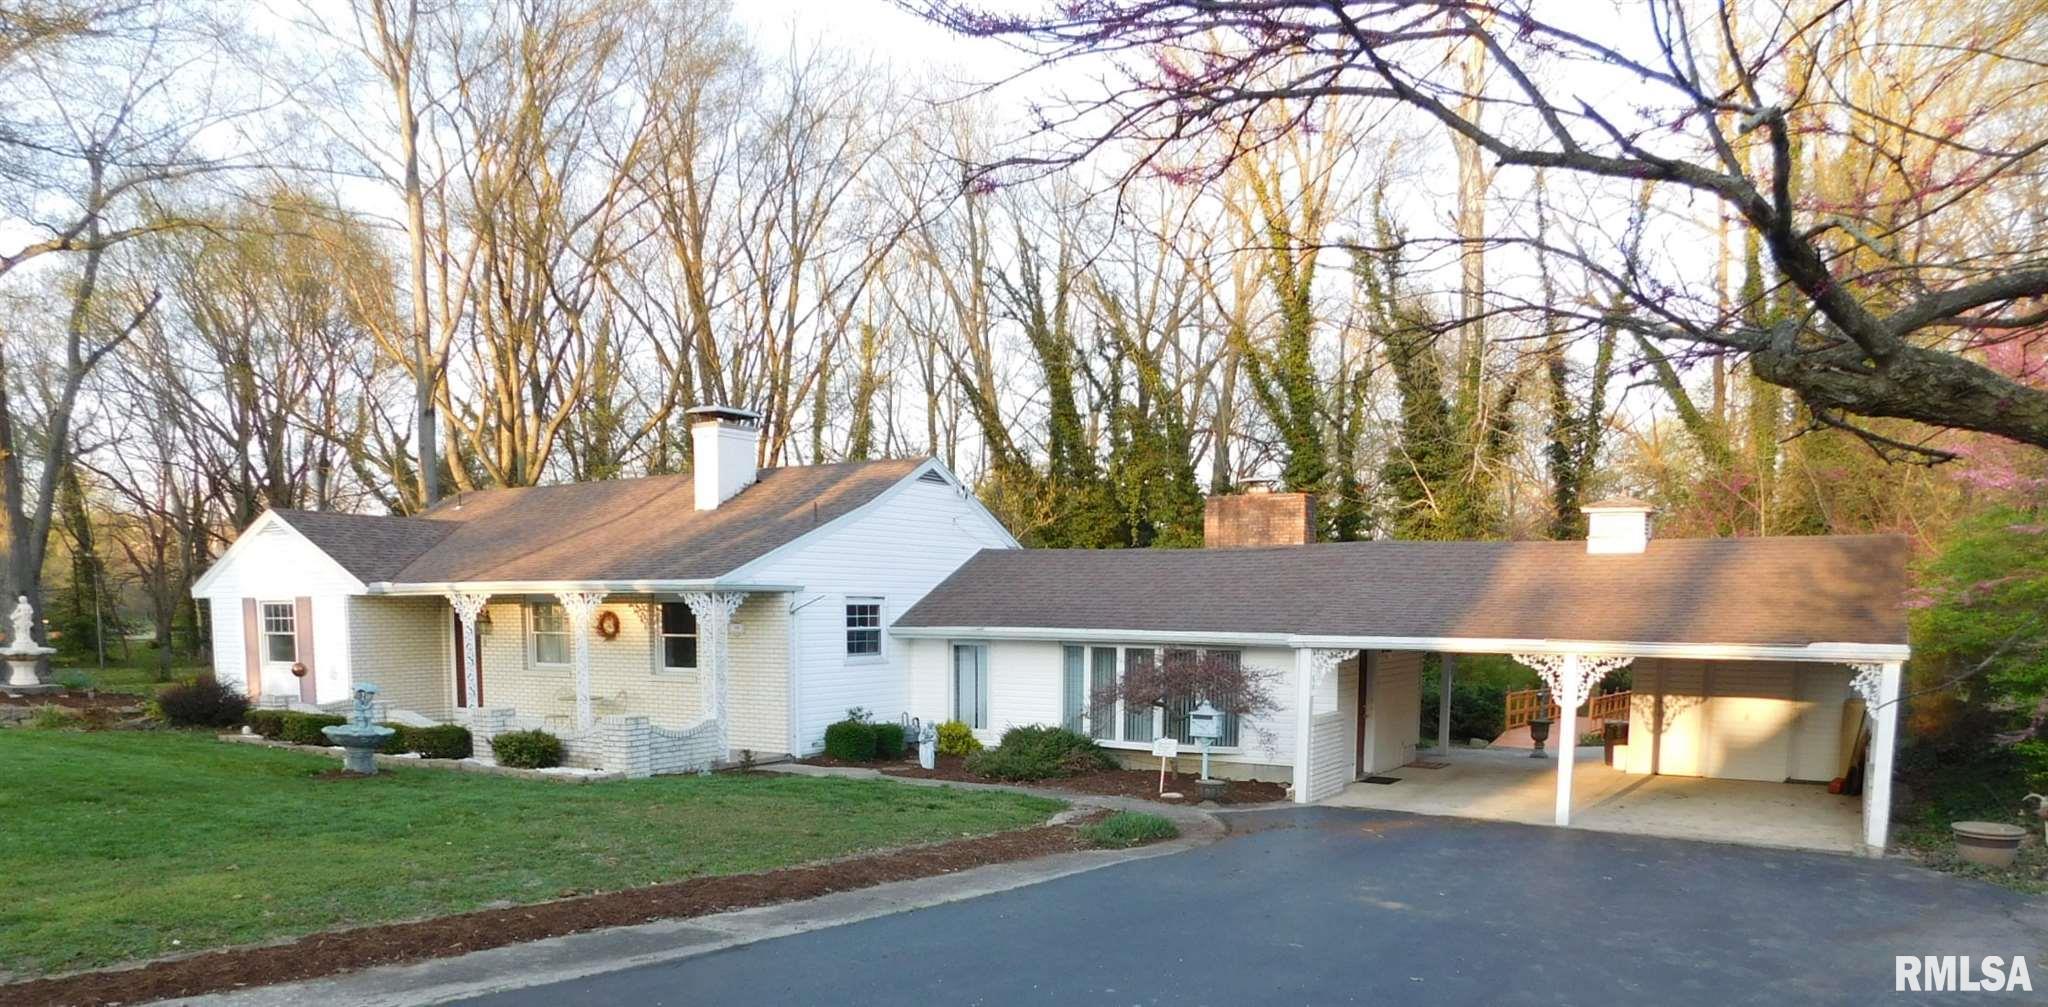 900 N COLLEGE Property Photo - Salem, IL real estate listing